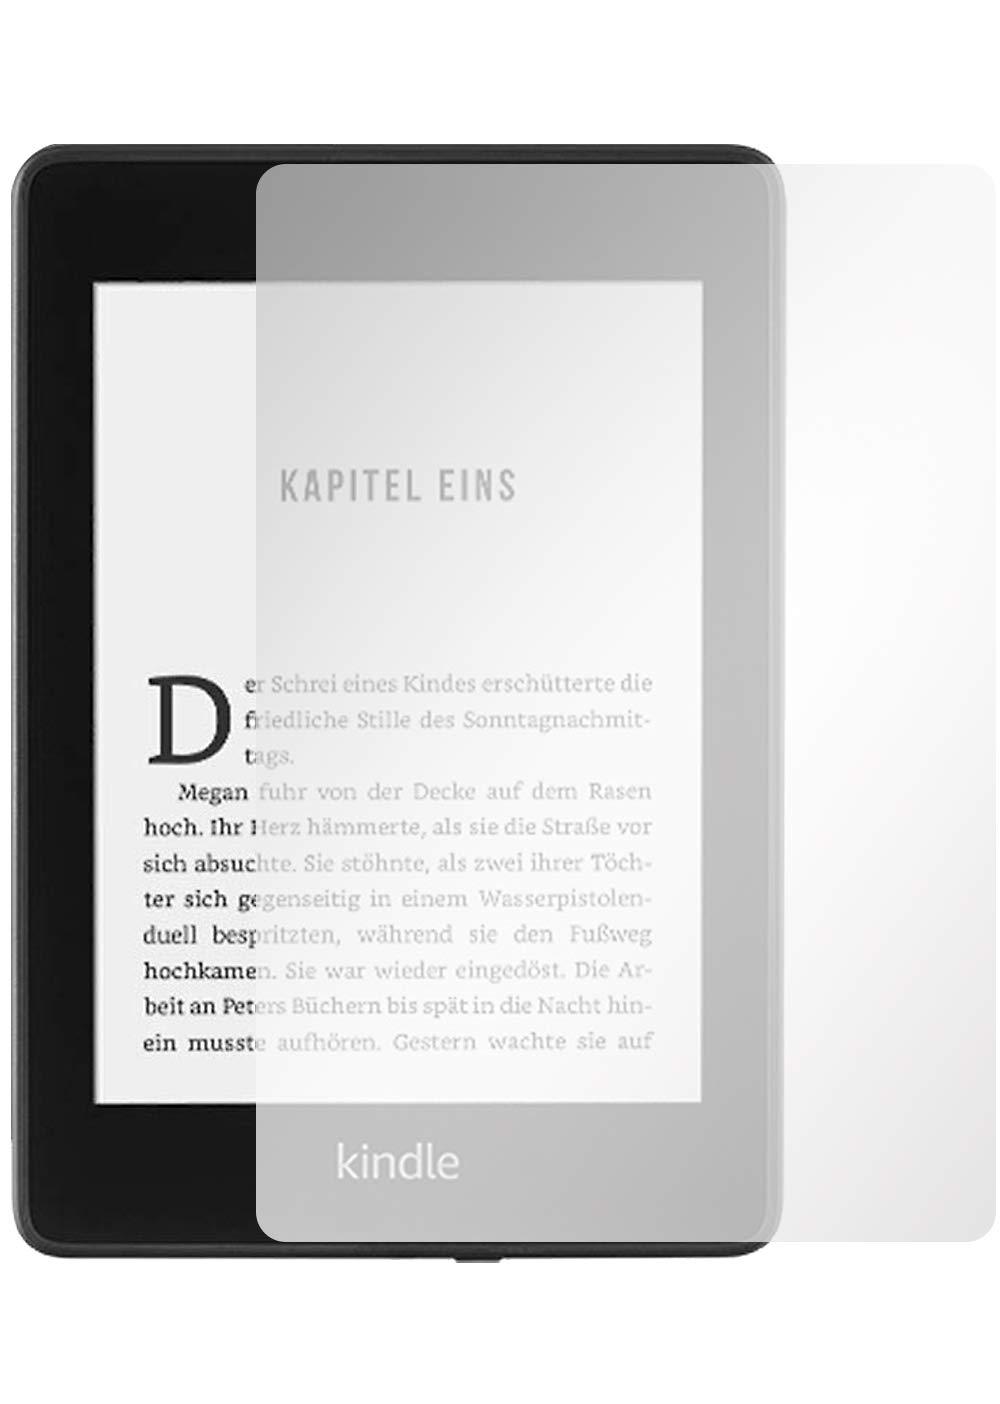 10. Generation Slabo 2 x Pellicola Protettiva per Display per Kindle Paperwhite 2018 Protezione Display Crystal Clear Invisibile Made in Germany